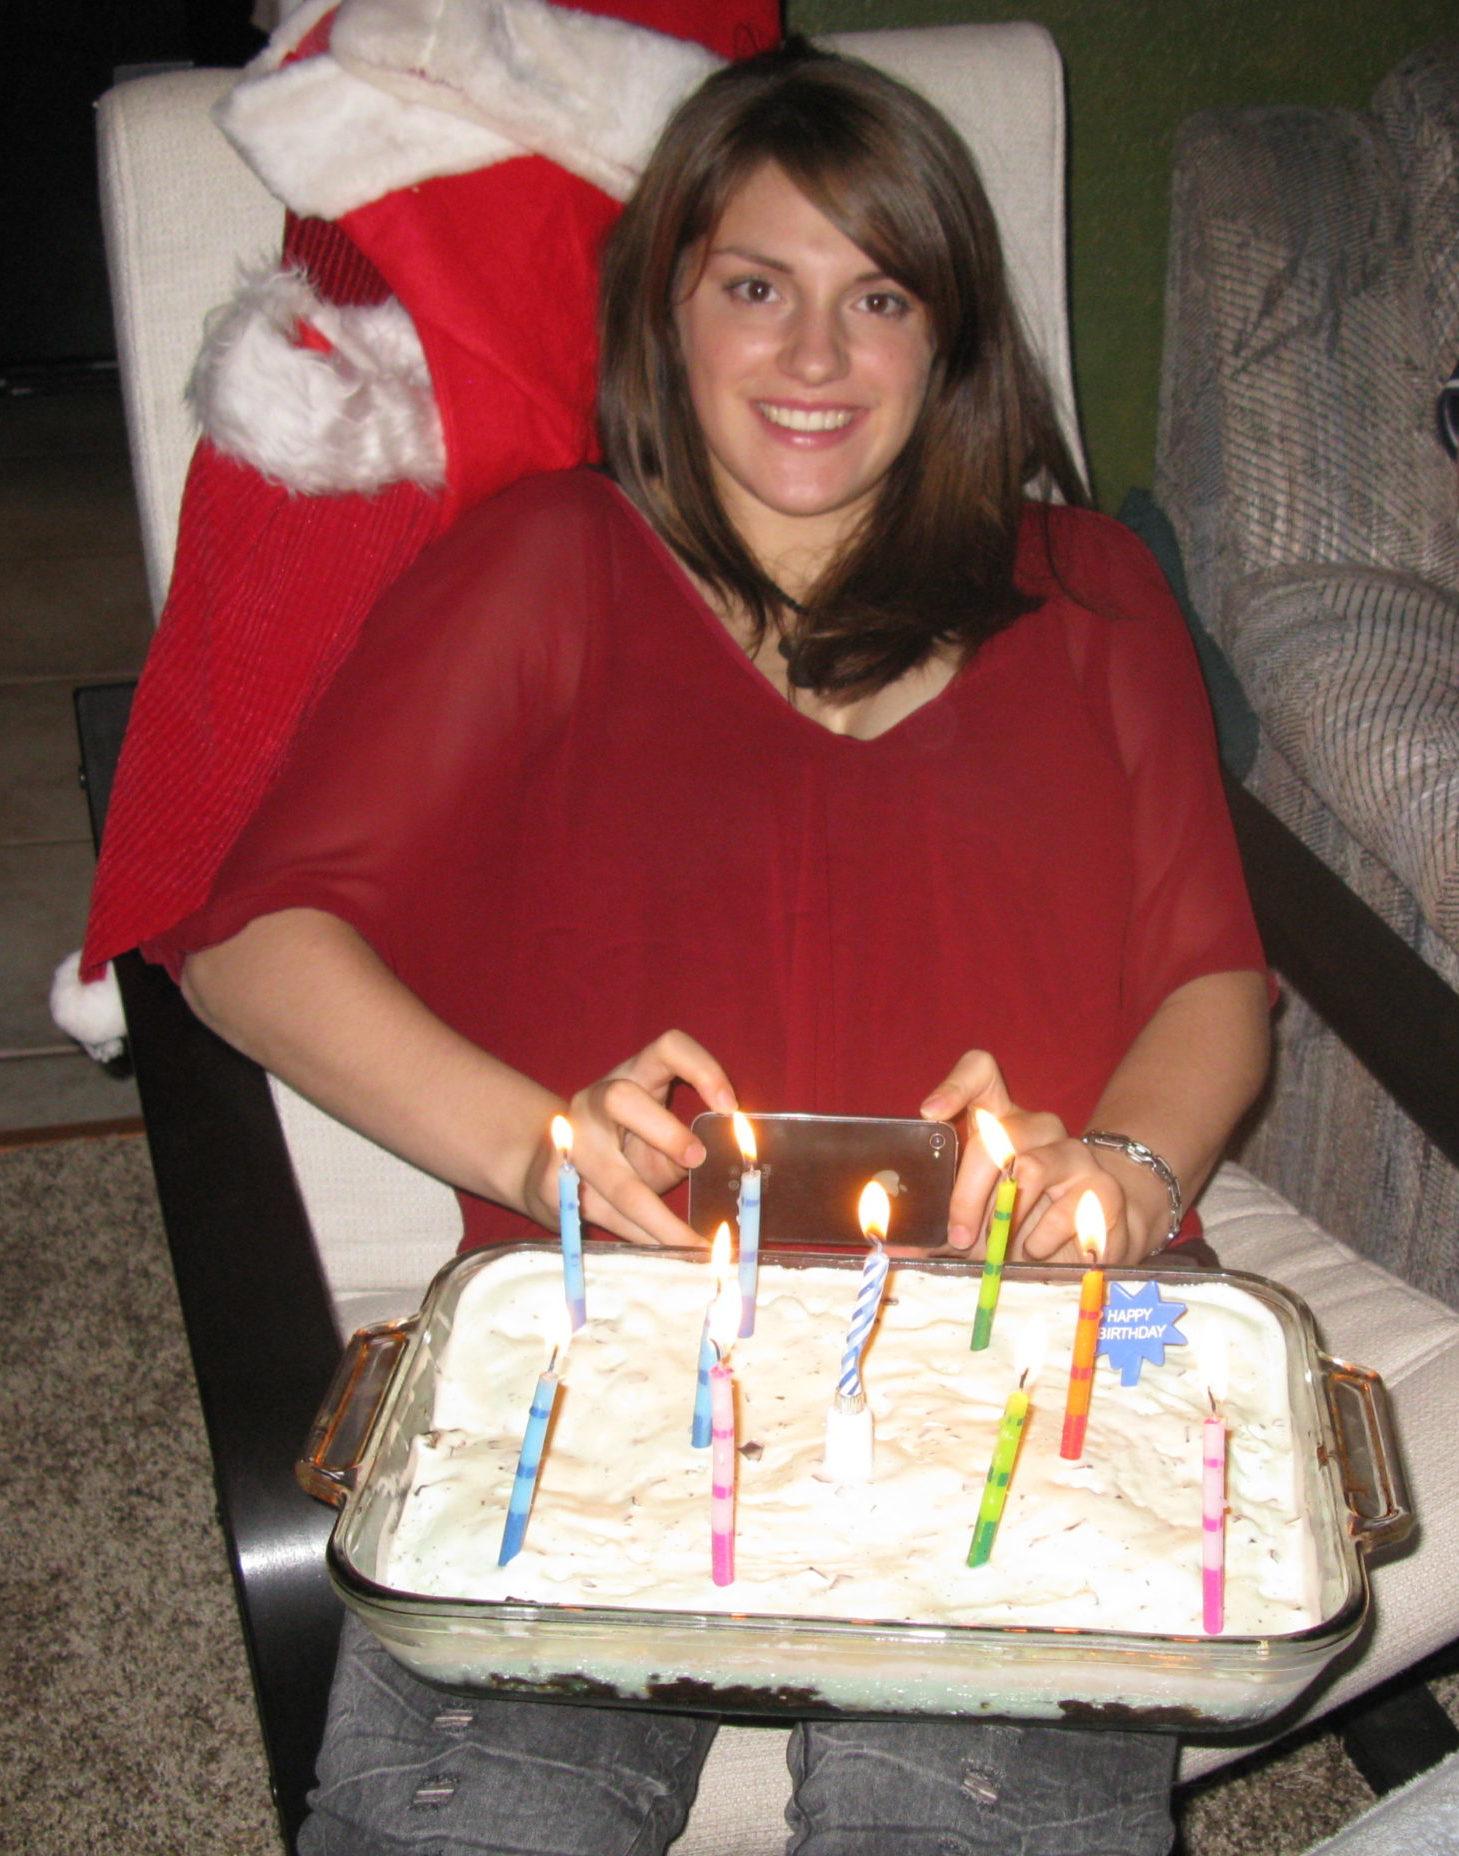 Angela's birthday cake